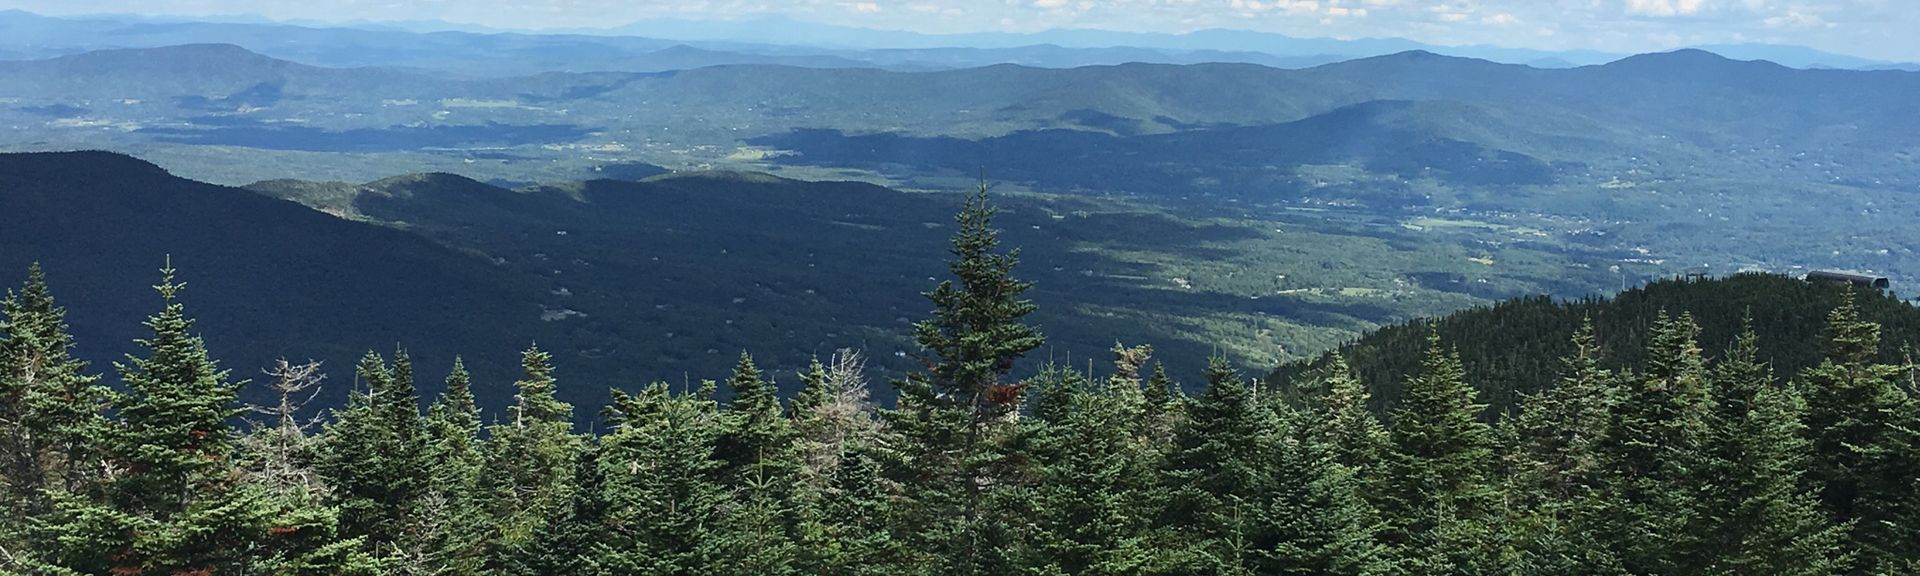 Wolcott, Vermont, Estados Unidos